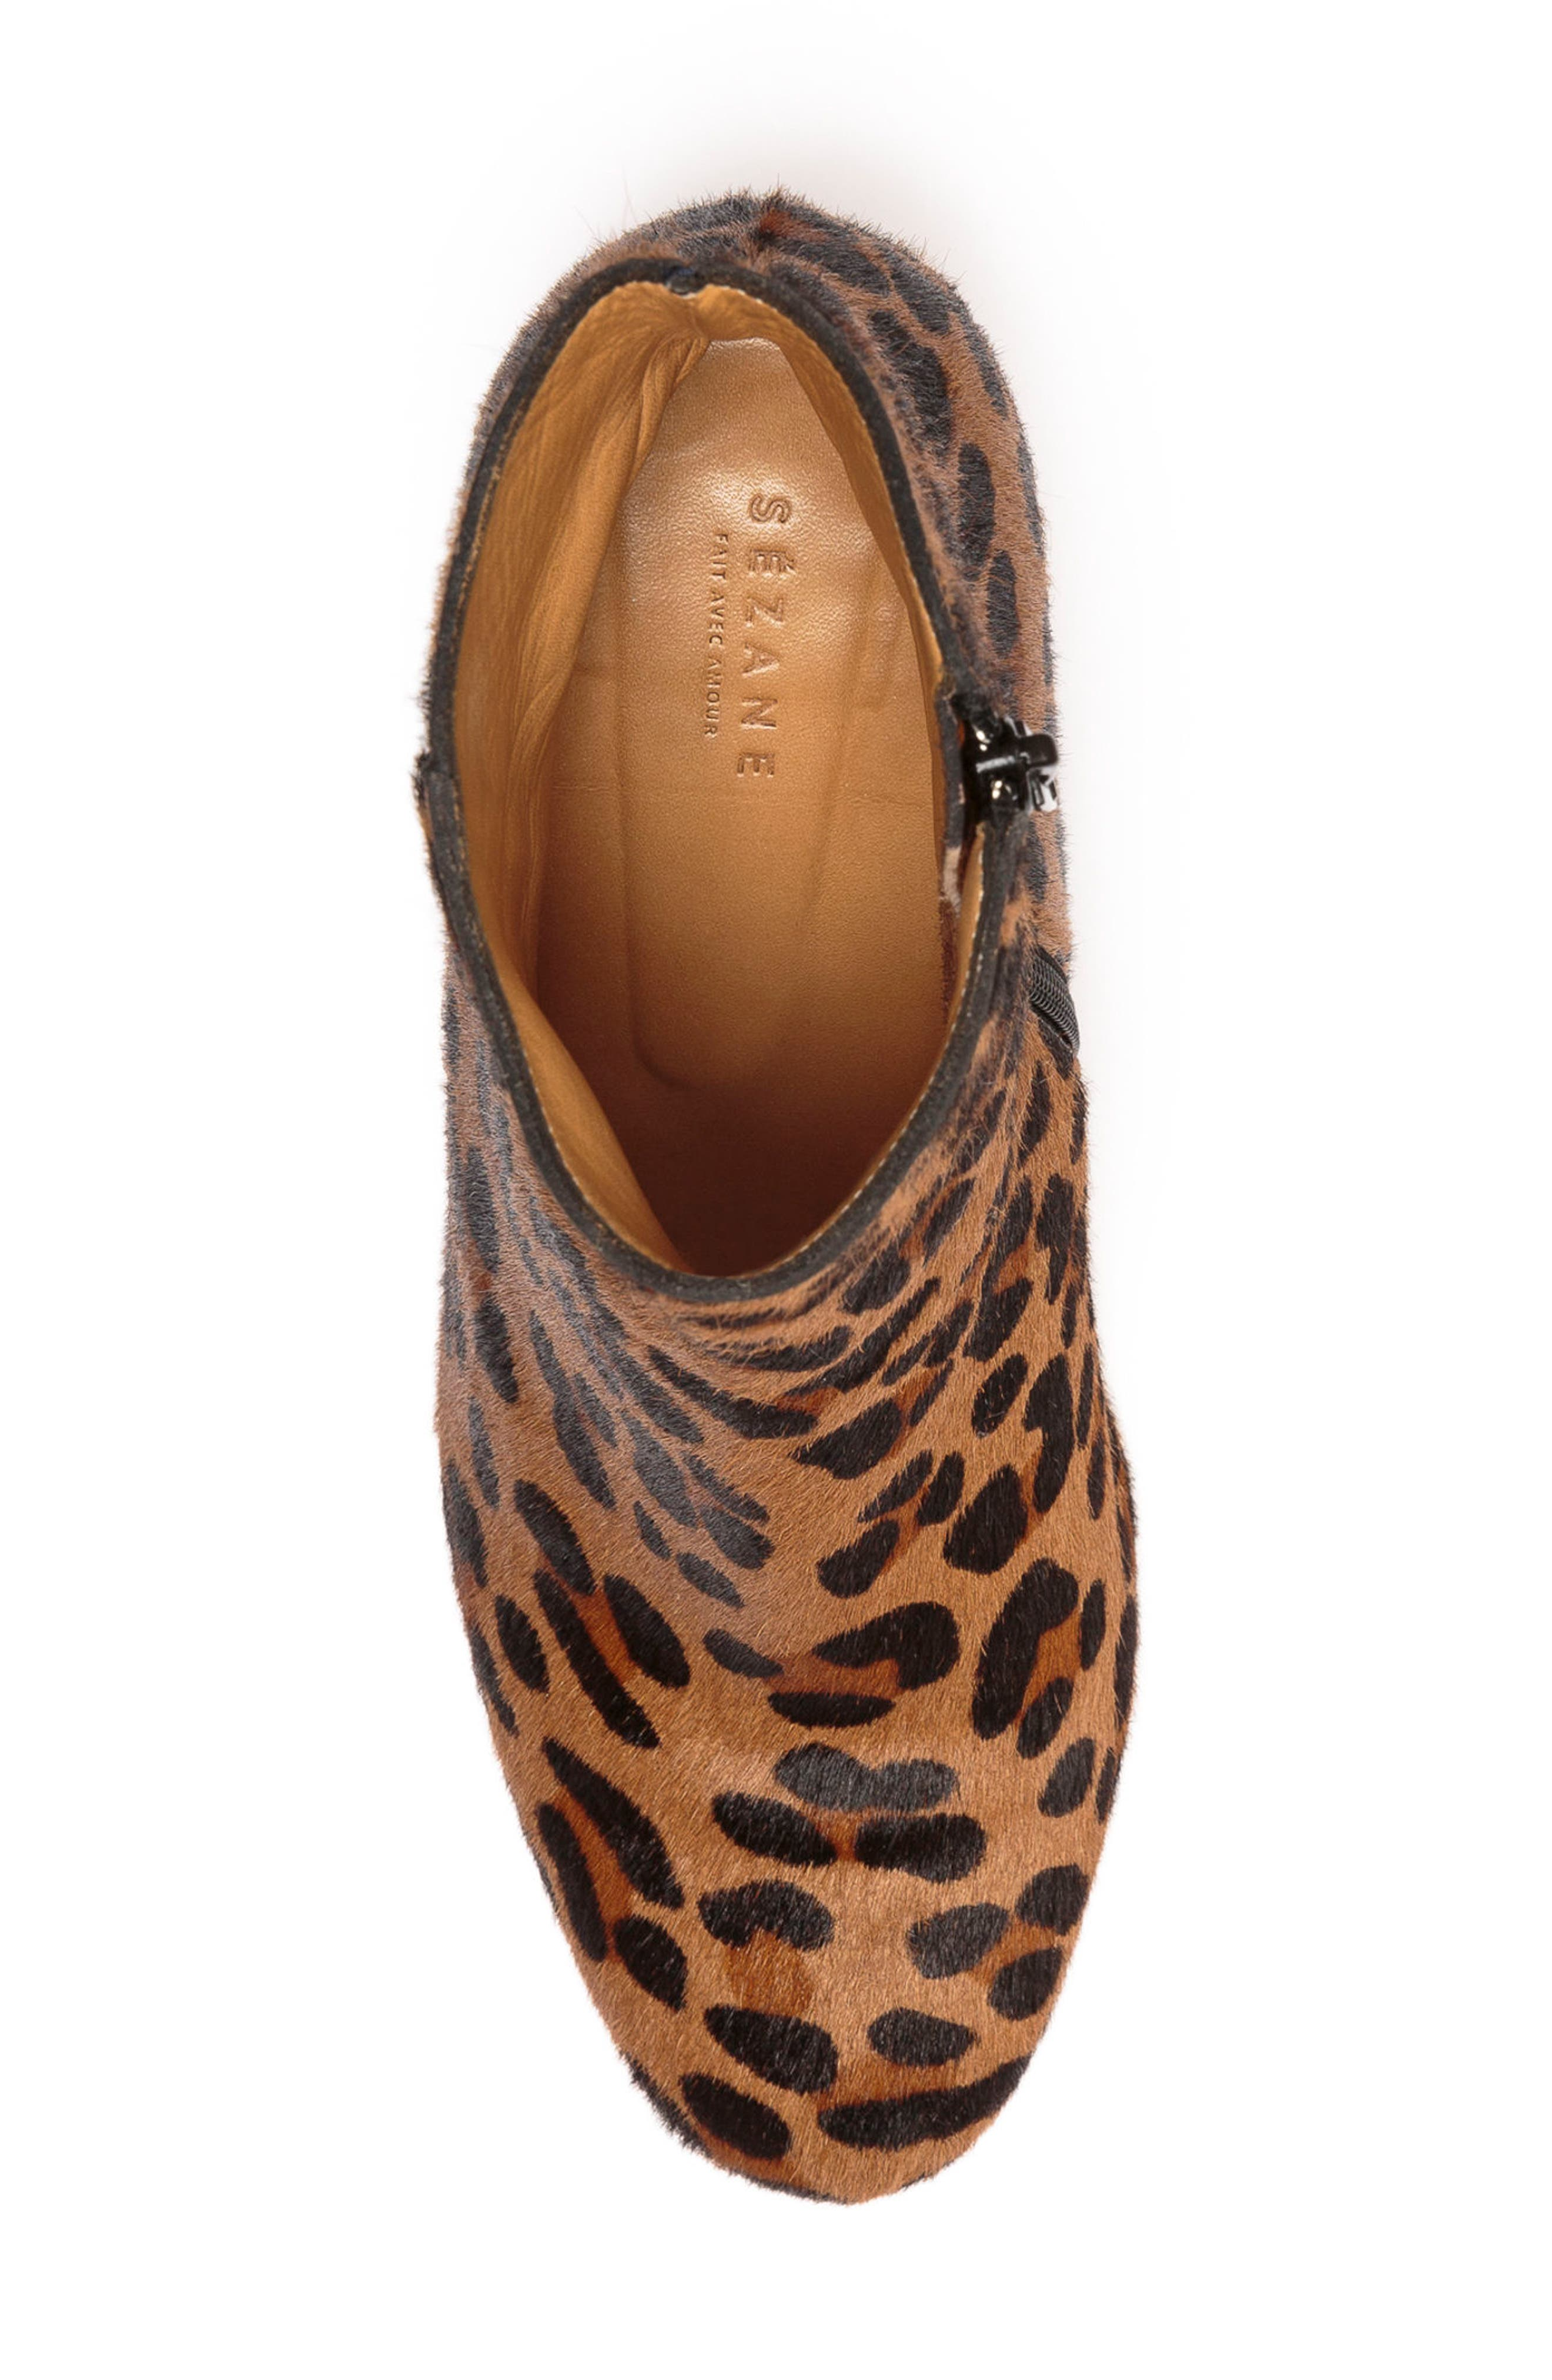 Léa Genuine Calf Hair Bootie,                             Alternate thumbnail 4, color,                             Leopard Print Leather